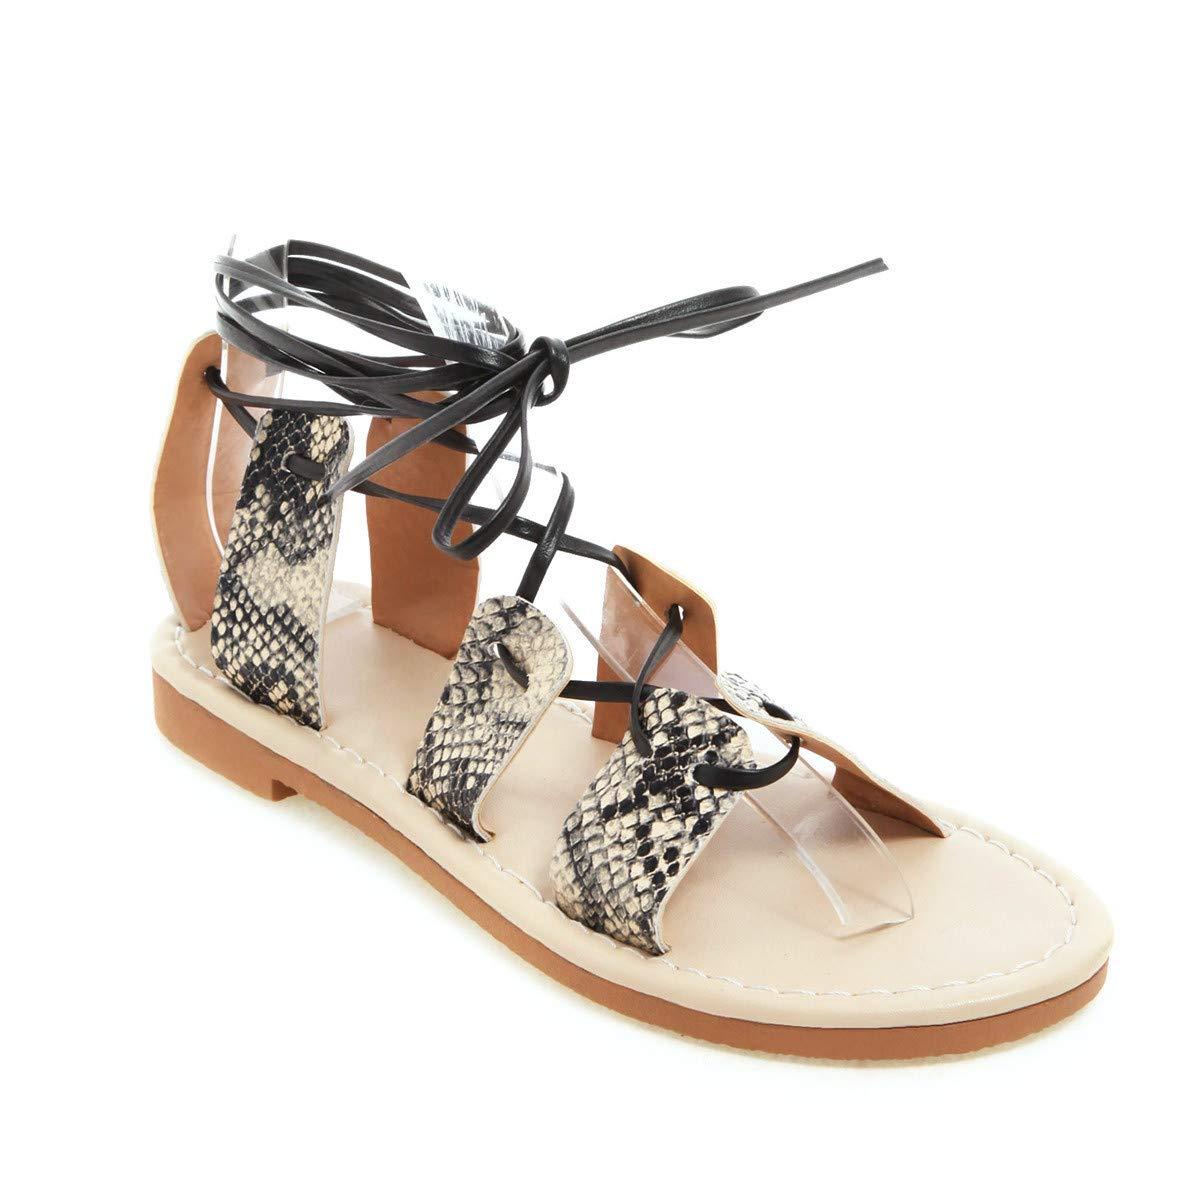 Hot Summer Cutout Lace Up Flats Leg Wrap Rome Sandals Open Toe Ankle-Cross Summer Beach Shoes (Yellow, 7.5)